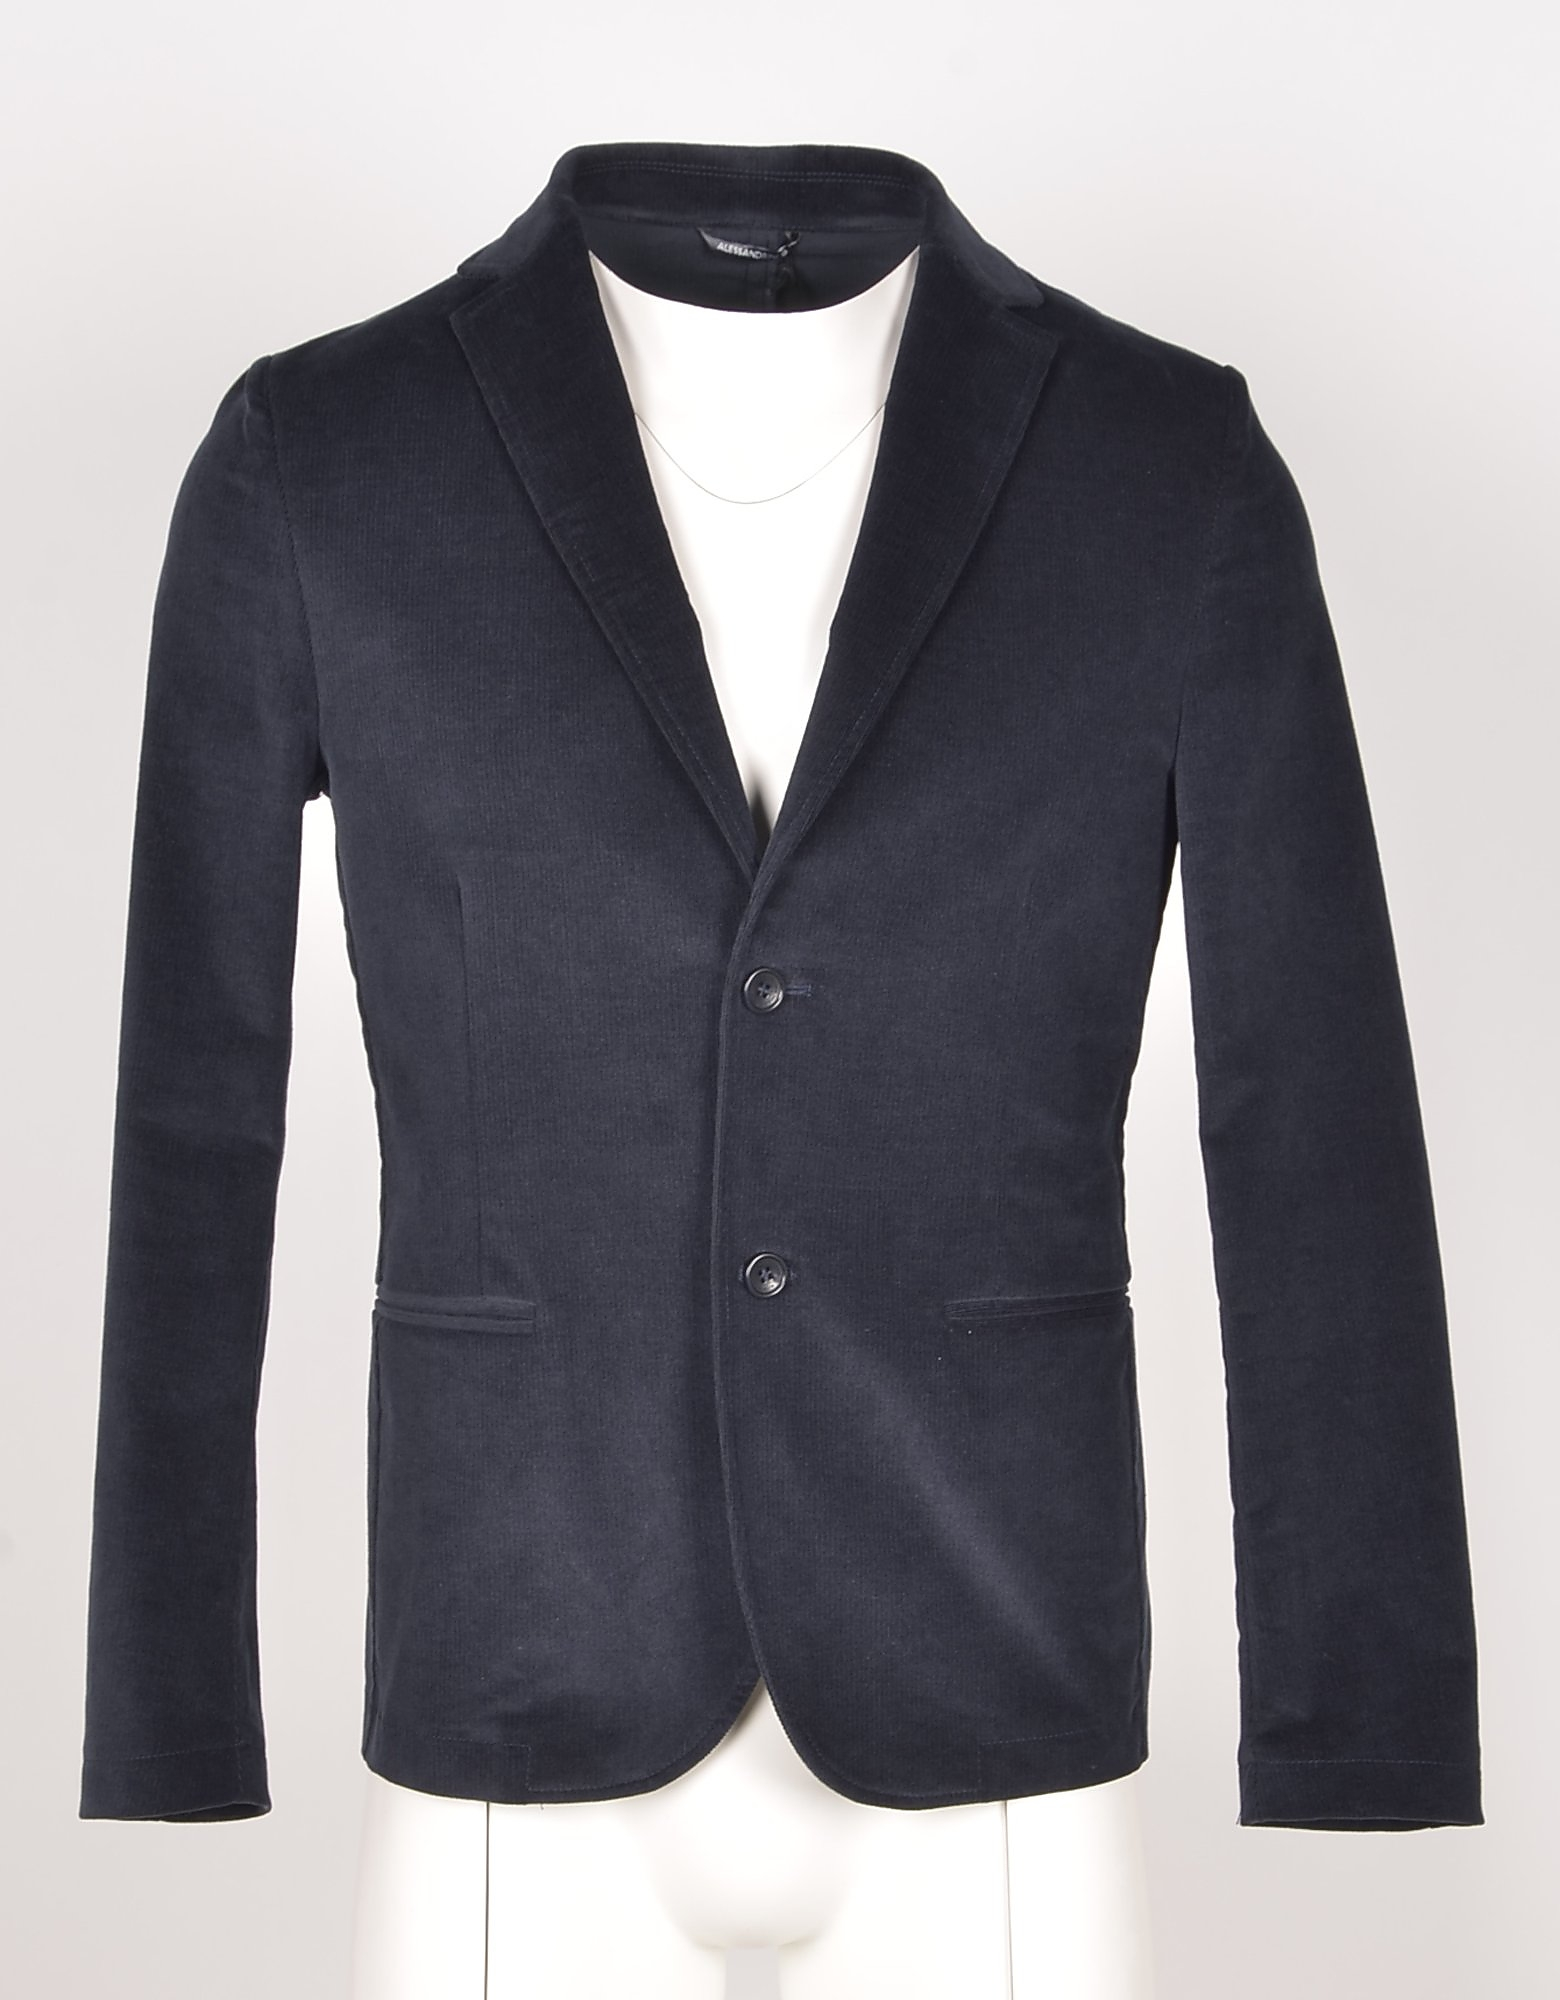 Daniele Alessandrini Designer Coats & Jackets, Men's Blue Blazer